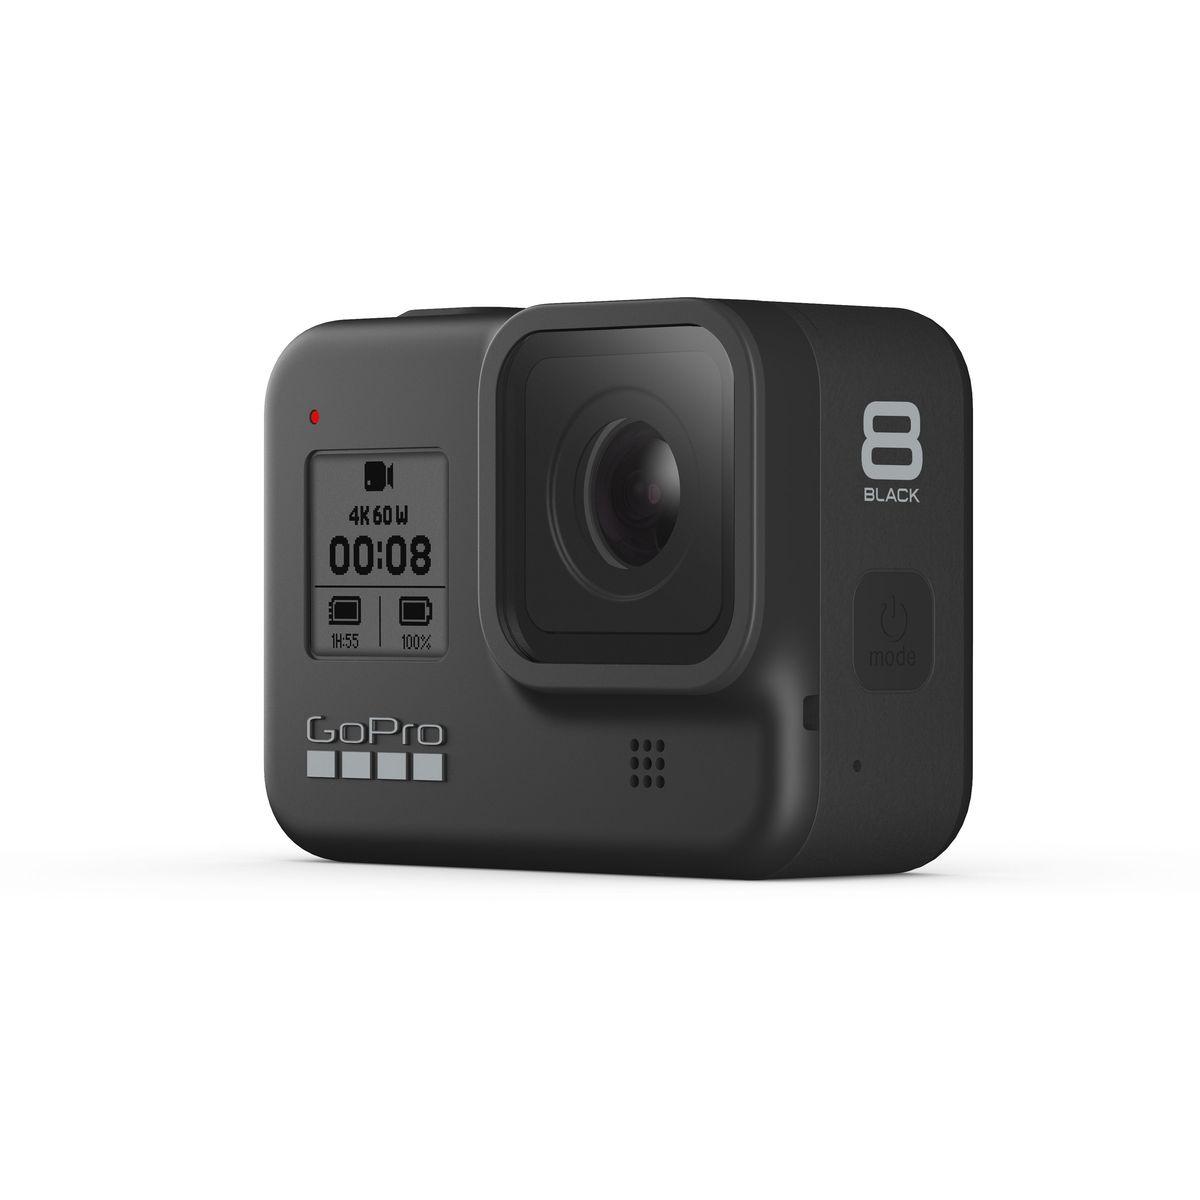 GoPro HERO8 Action Camera Black